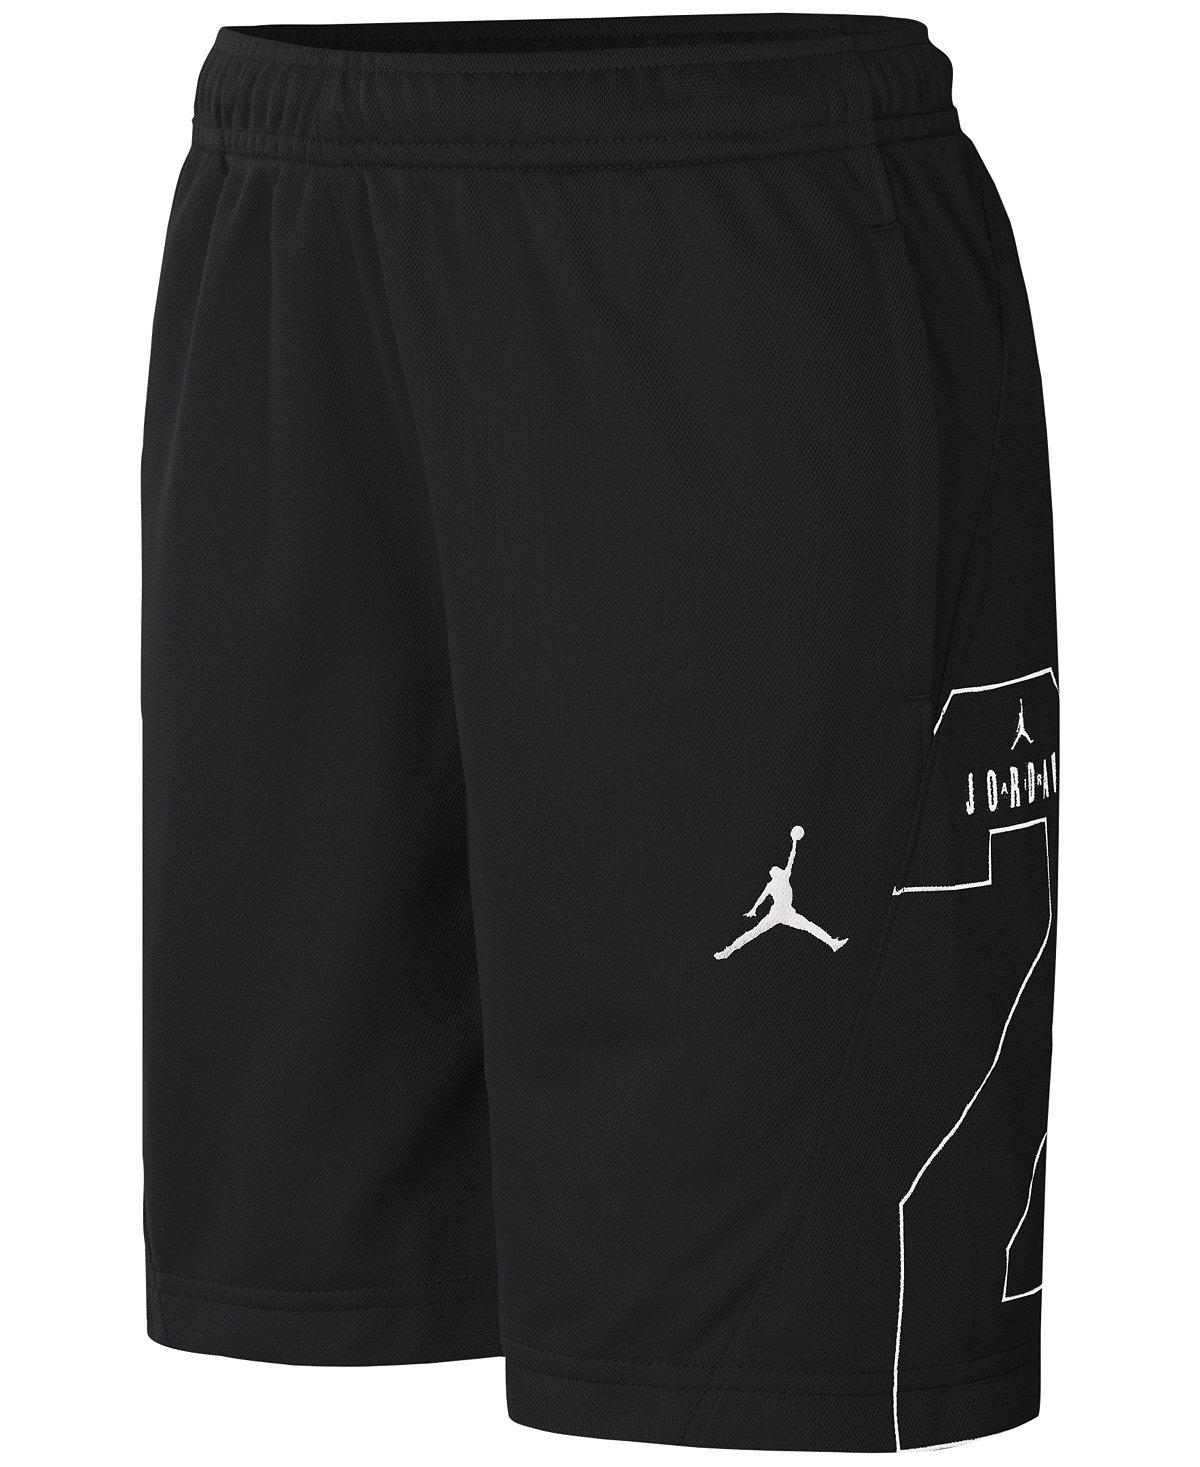 Nike Jordan Boys' Two-Three Basketball Shorts (5, Black (953961-023) / White/Black)